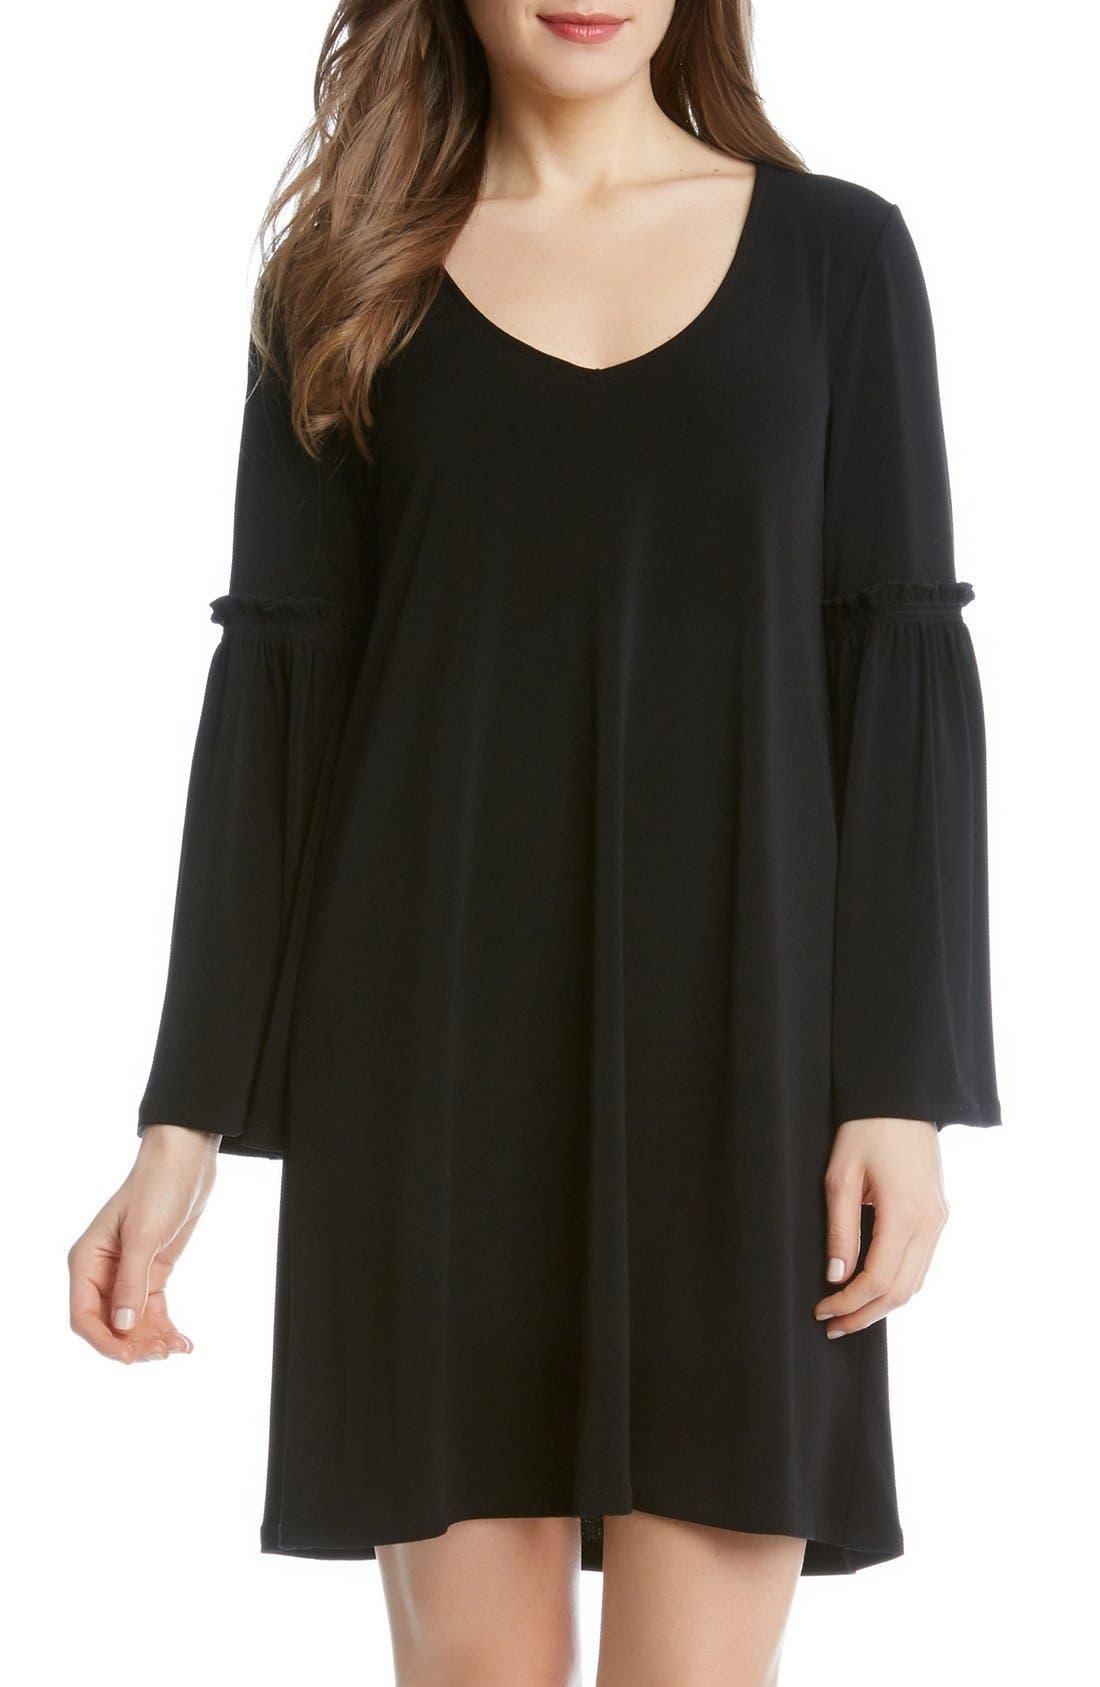 Alternate Image 1 Selected - Karen Kane Bell Sleeve A-Line Dress